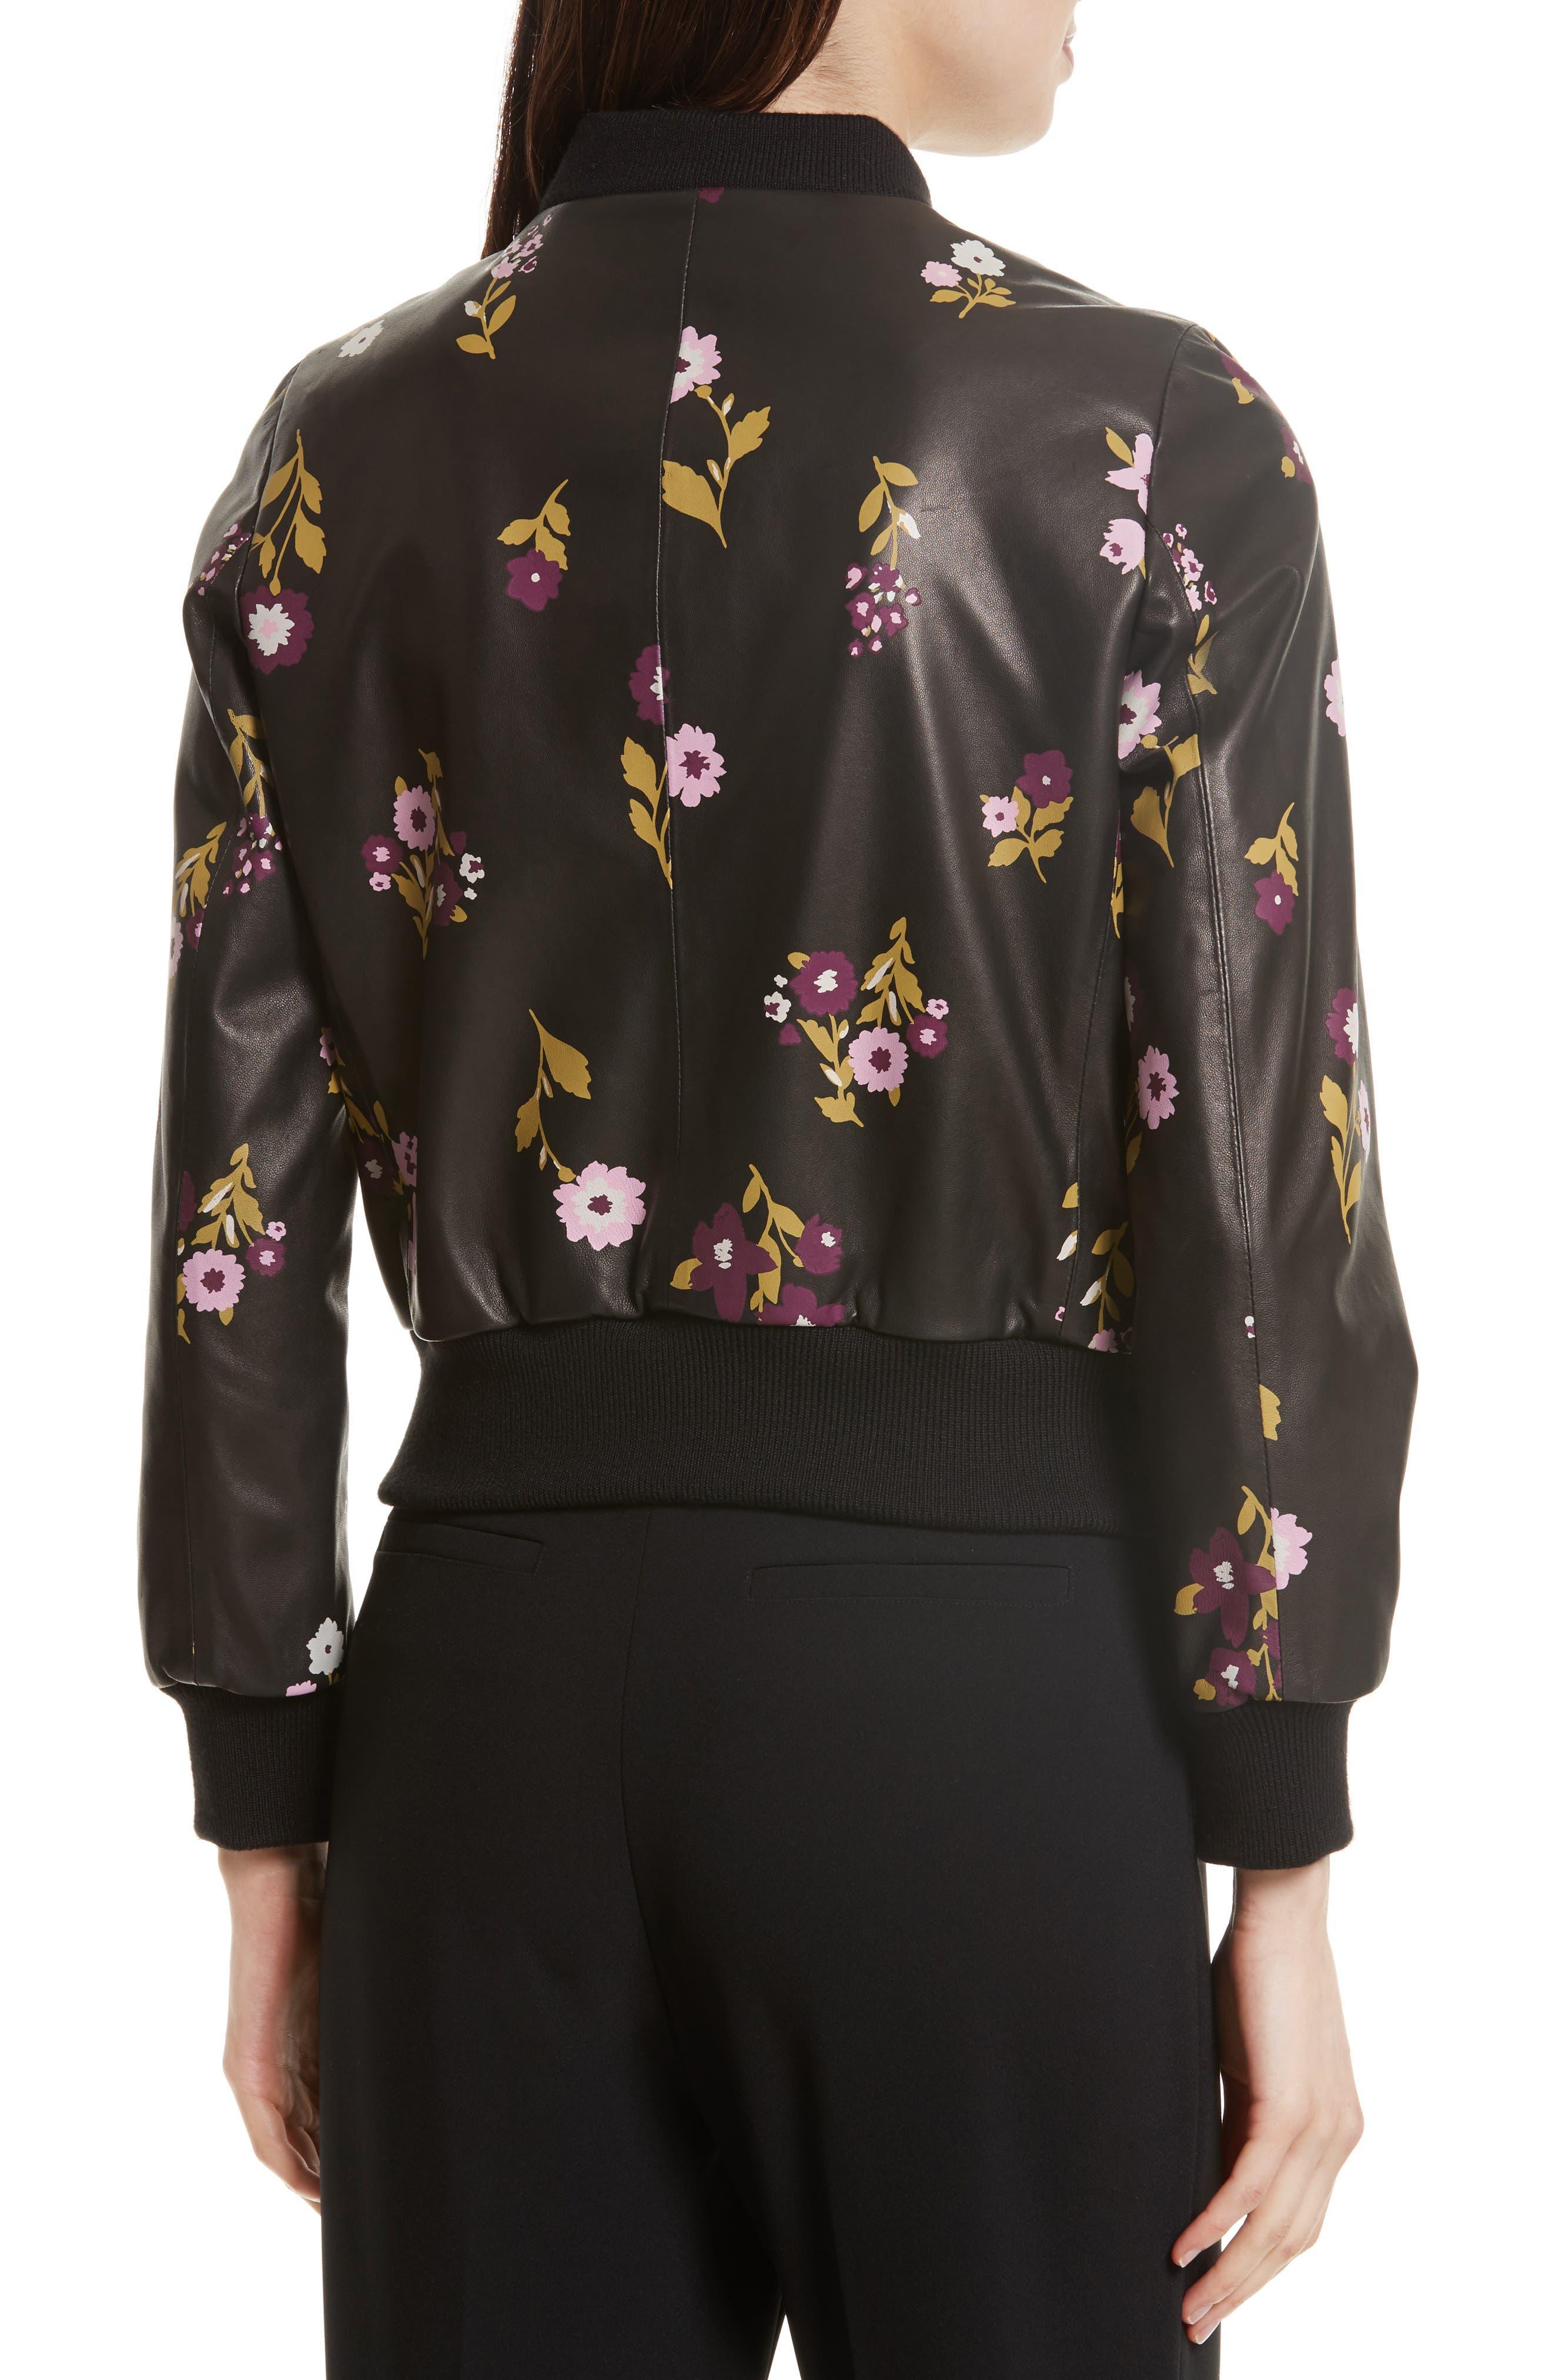 in bloom leather bomber jacket,                             Alternate thumbnail 2, color,                             Black